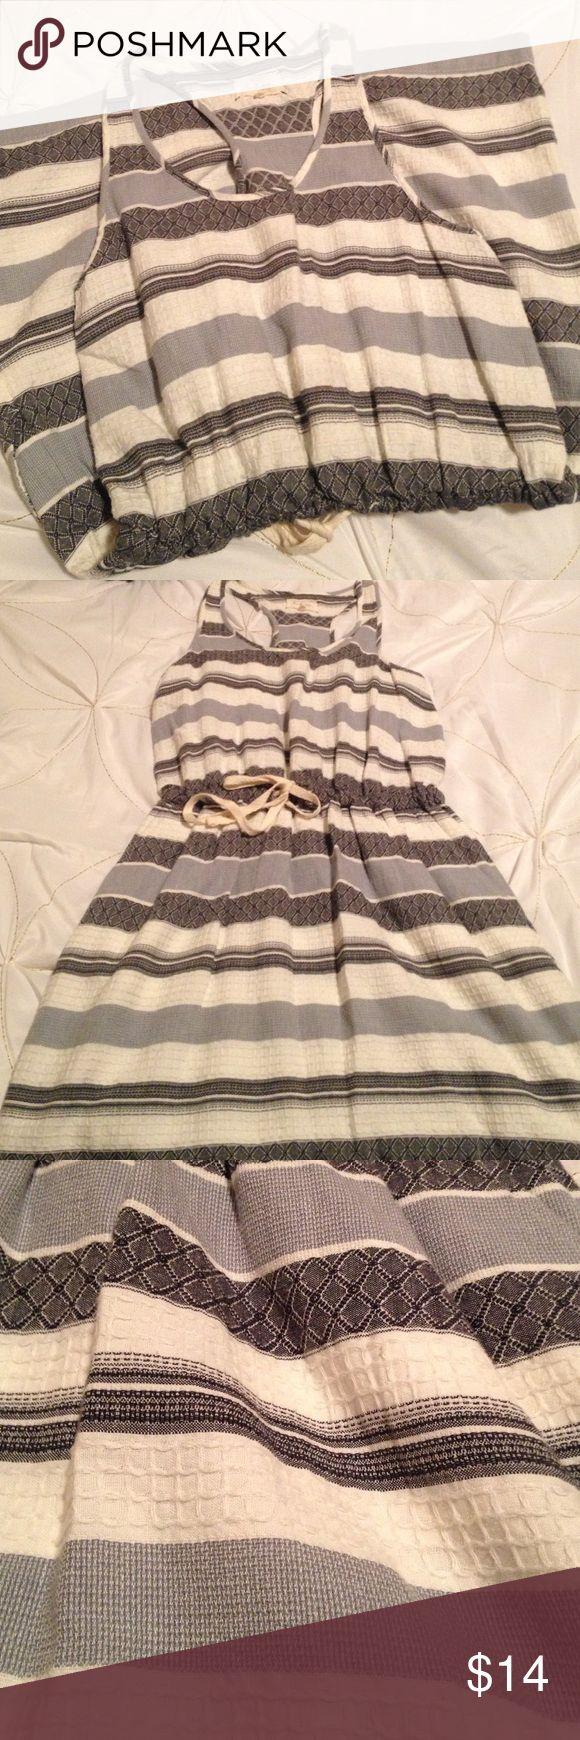 "🍉 Lou & Grey razorback dress Textured pattern razorback tank dress with easy drawstring waist. 16"" skirt. Lou & Grey Dresses"